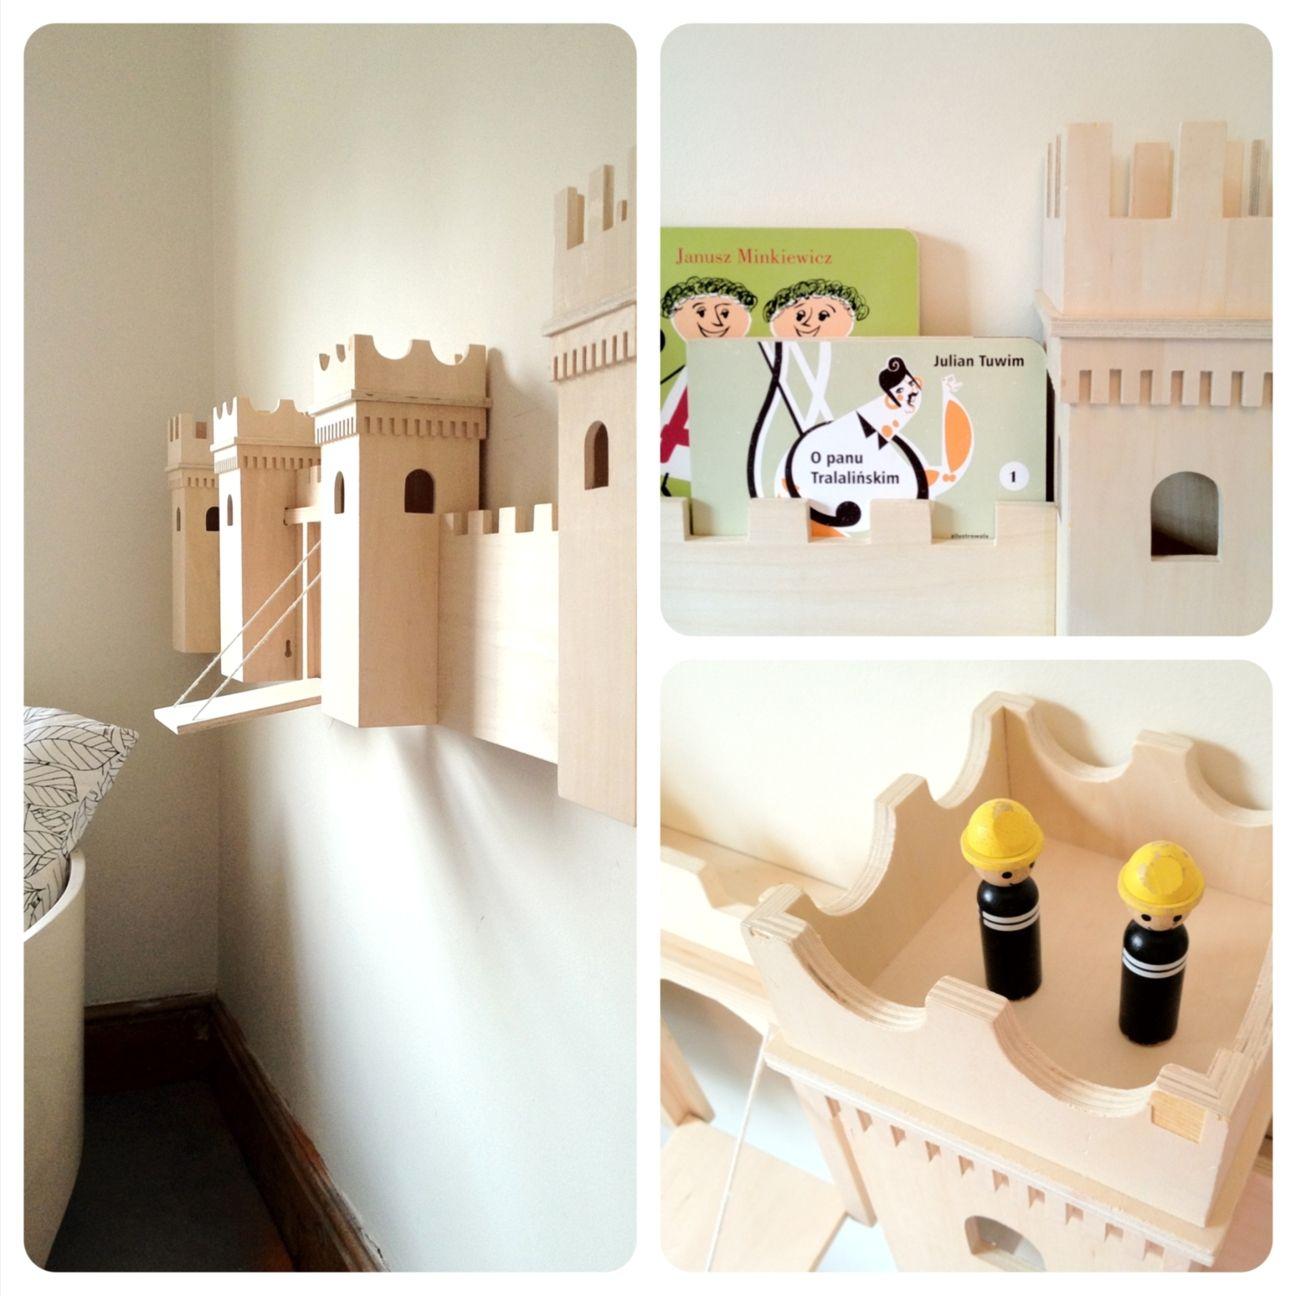 Mesy design diy project castle turned into bookshelf дизайн